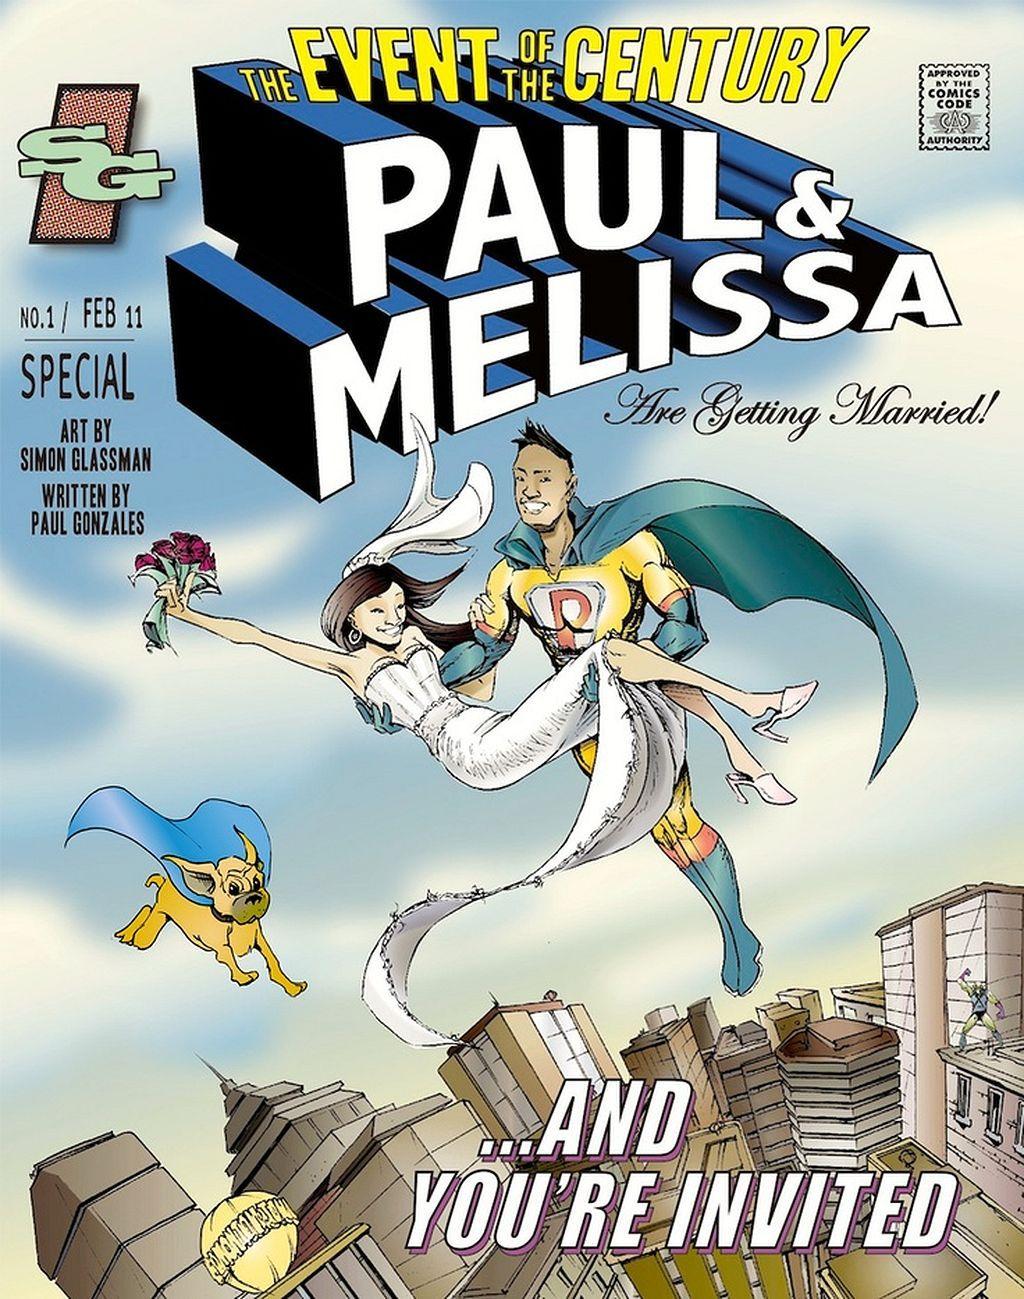 222 Superhero Themed Wedding Ideas Book Invitationswedding Favorswedding